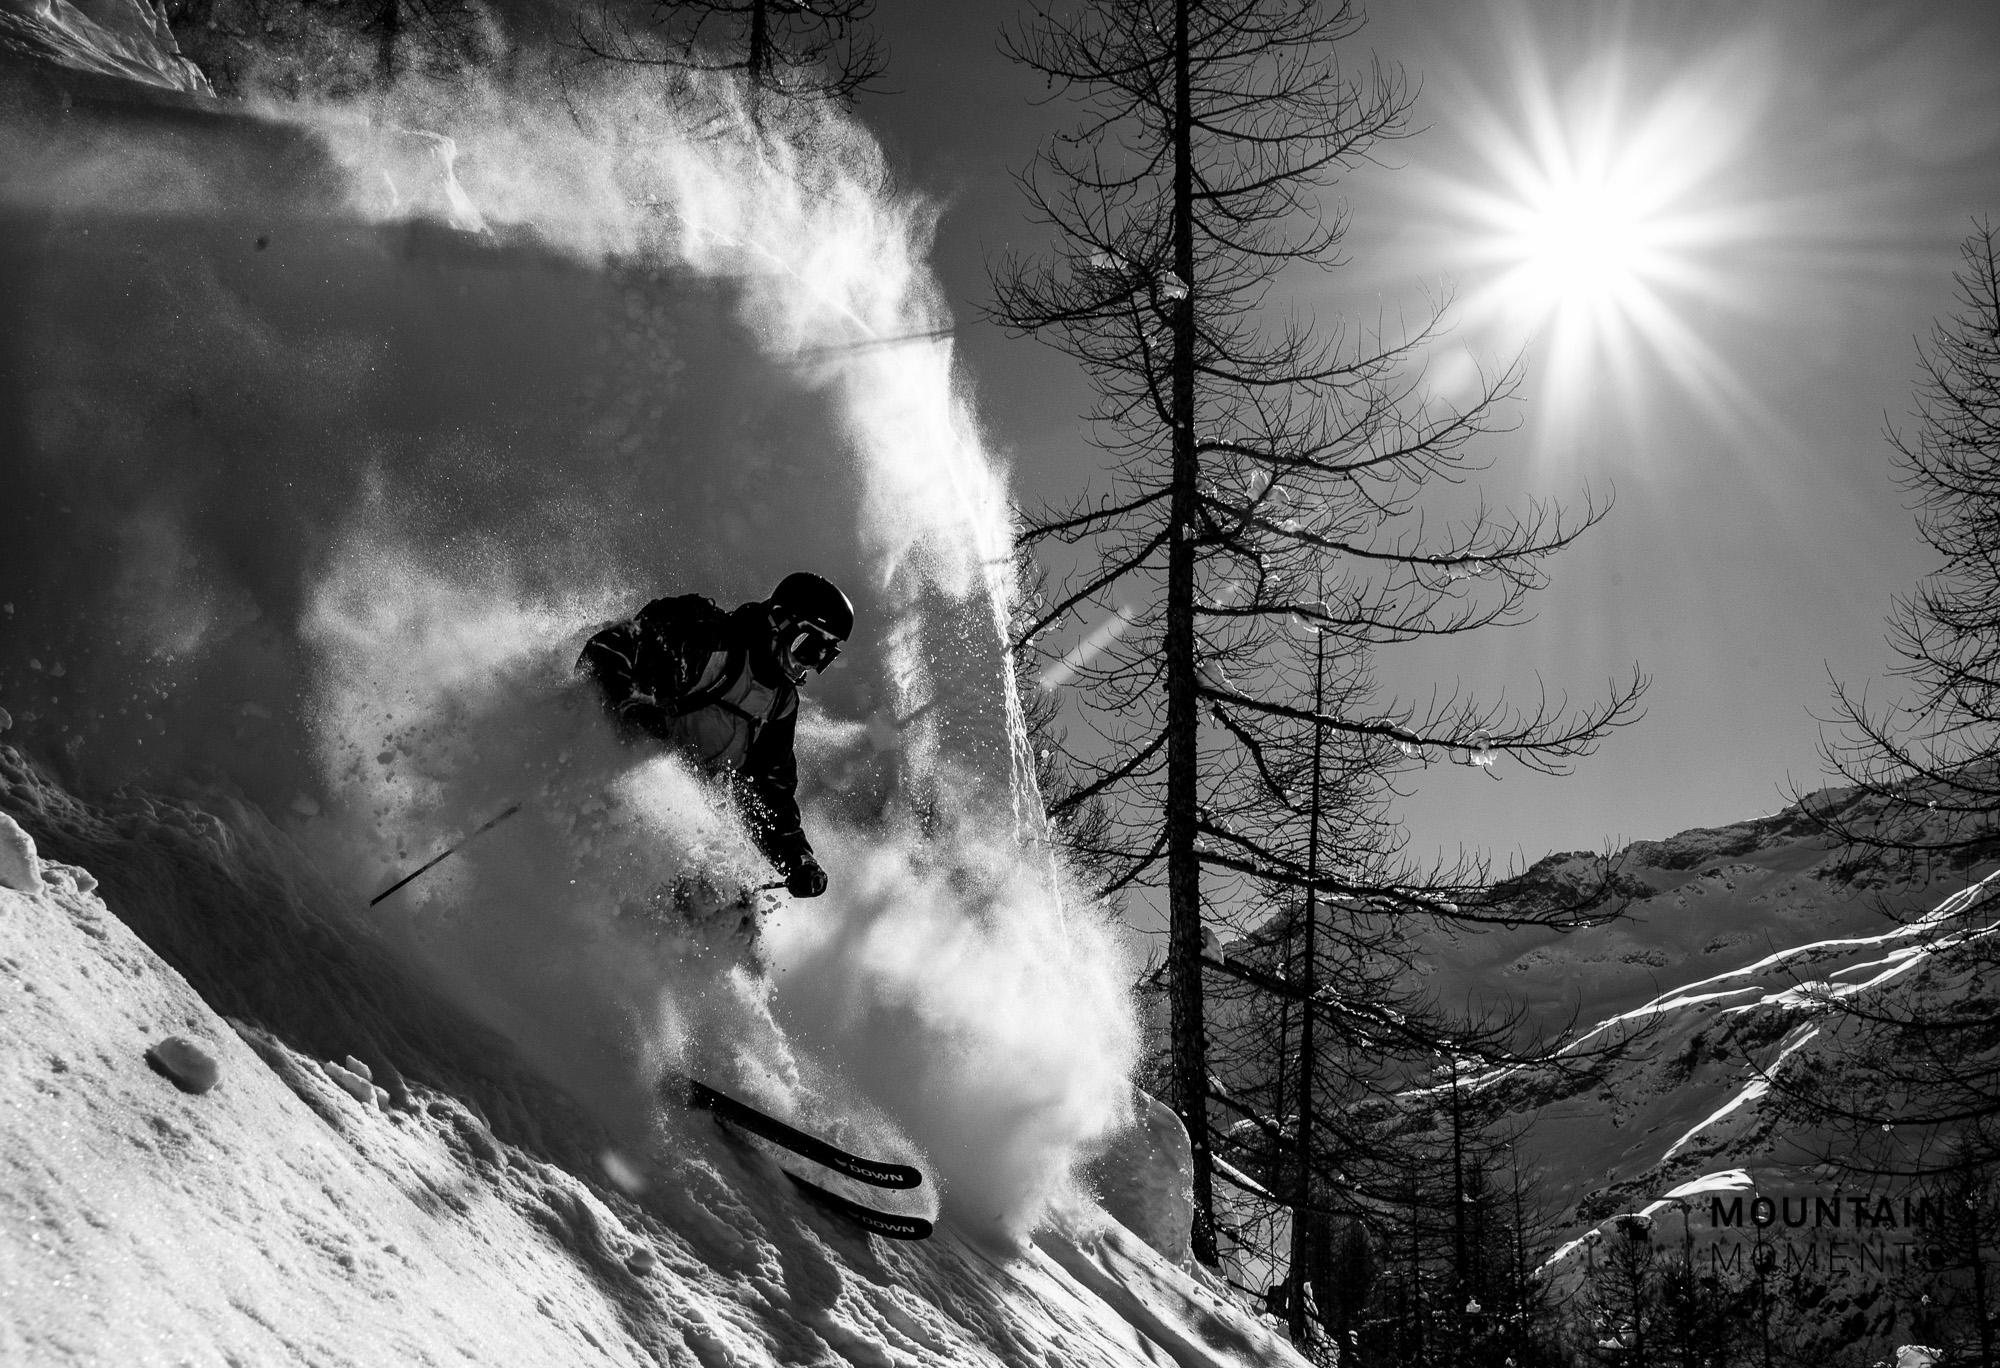 skitour, freeride, vinzentpyramide, skitour vinzentpyramide, freeride aosta, freeride alagna, skitour alagna, skitour gressoney, freeride gressoney, foto gressoney, foto vinzentpyramide